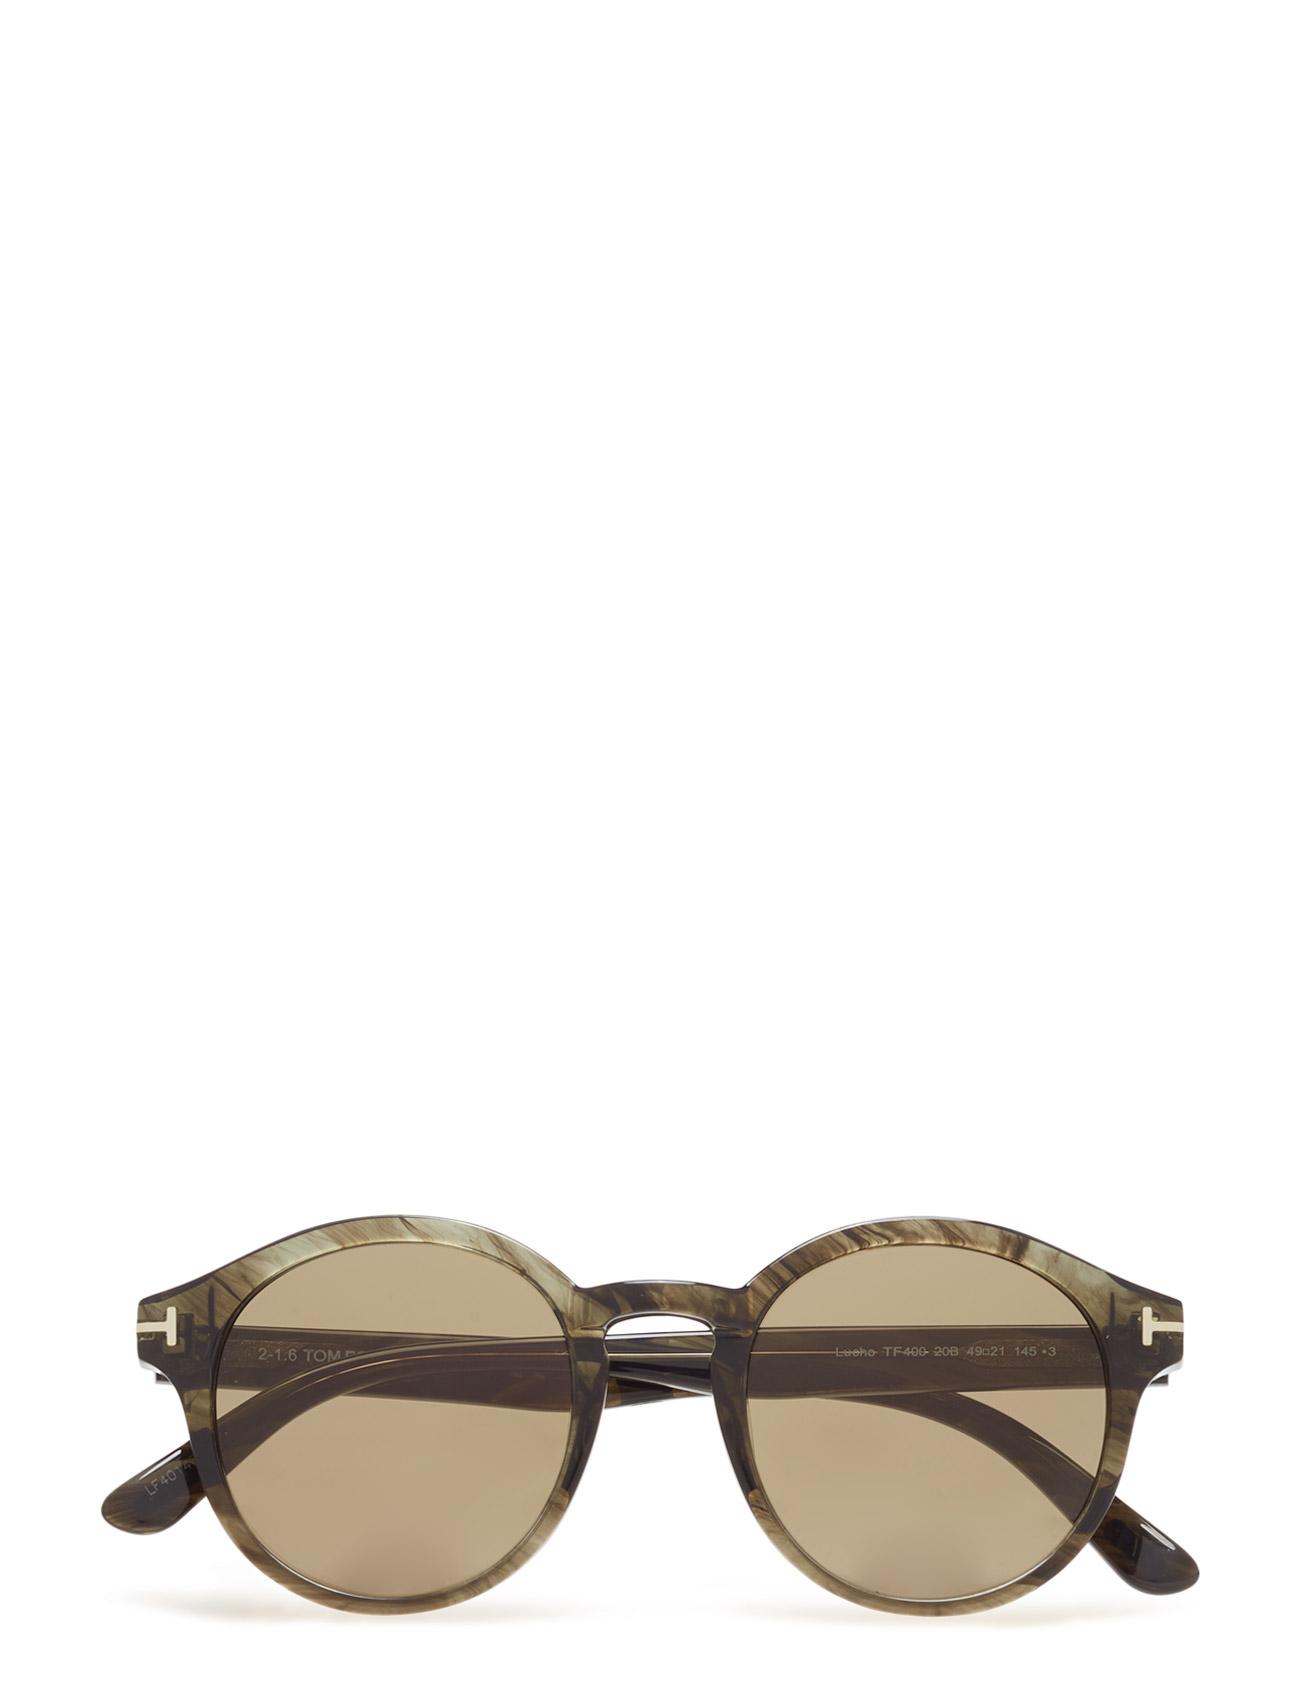 f888d8356461 Tom Ford Lucho Tom Ford Sunglasses Solbriller til Damer i ...